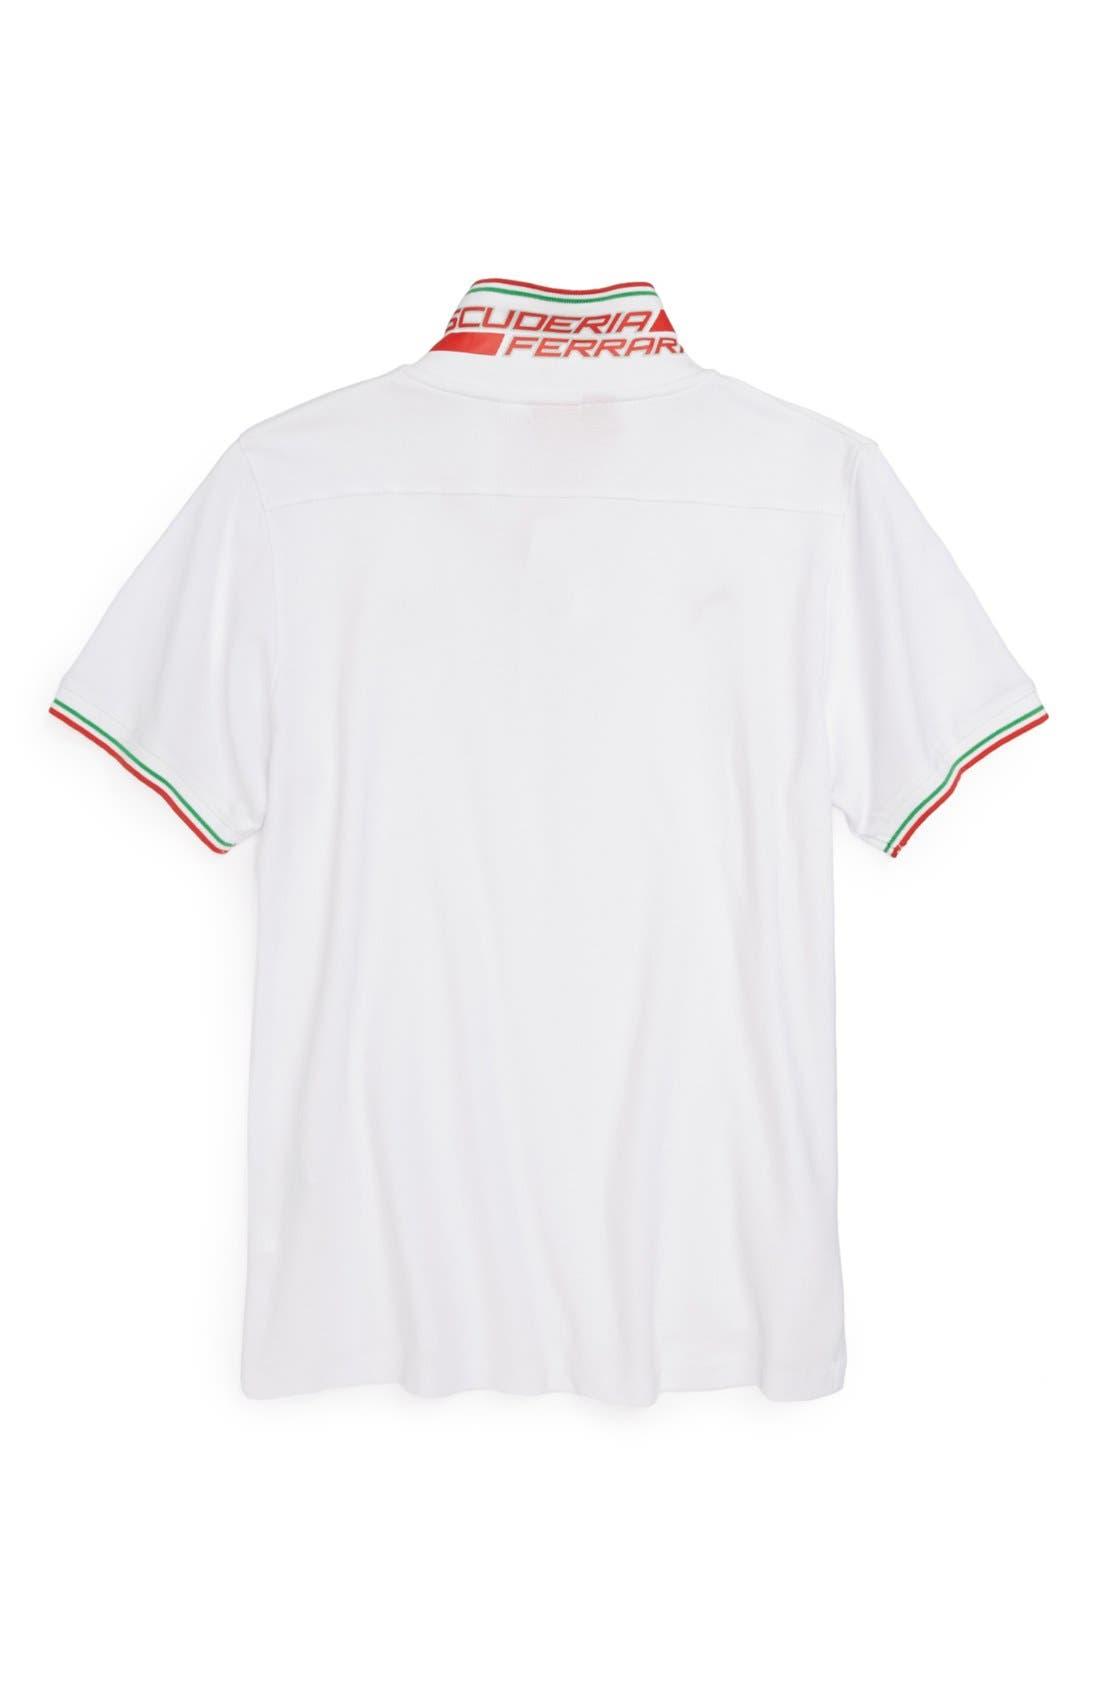 'Ferrari' Polo,                             Alternate thumbnail 2, color,                             100